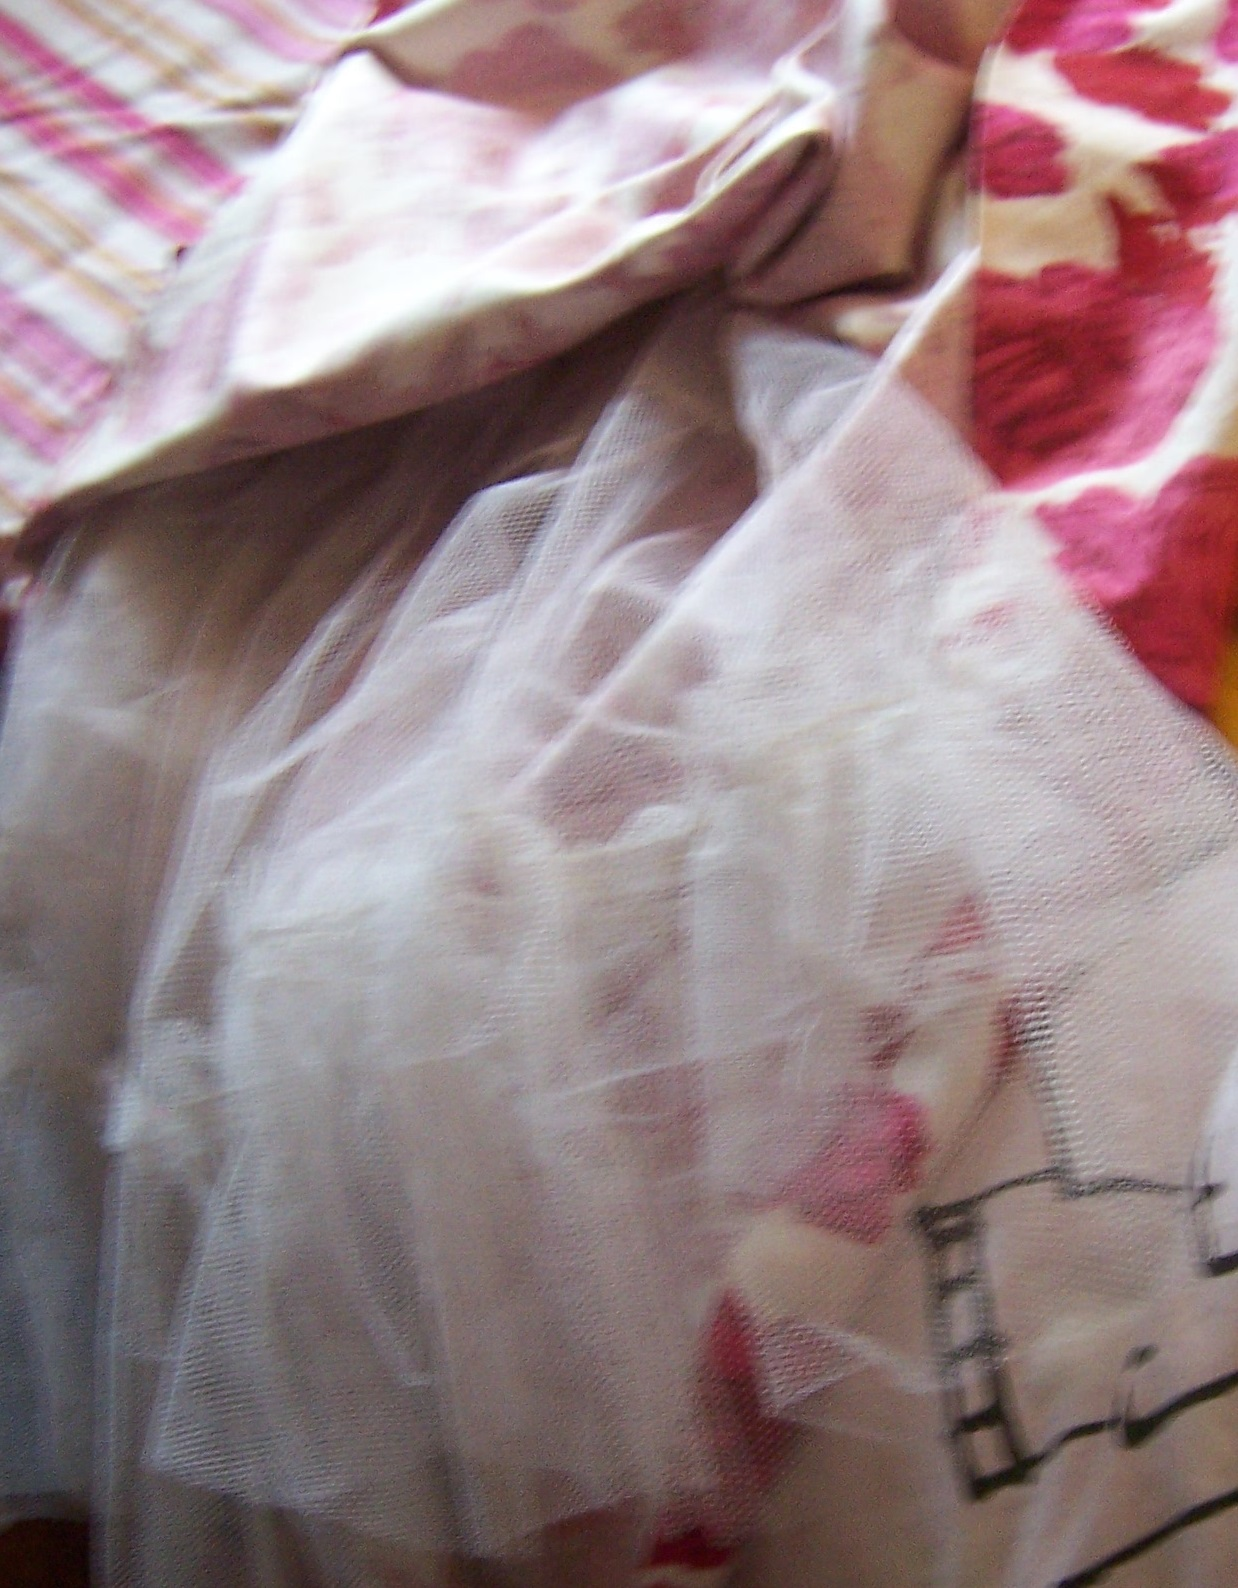 Vintage dress crinoline